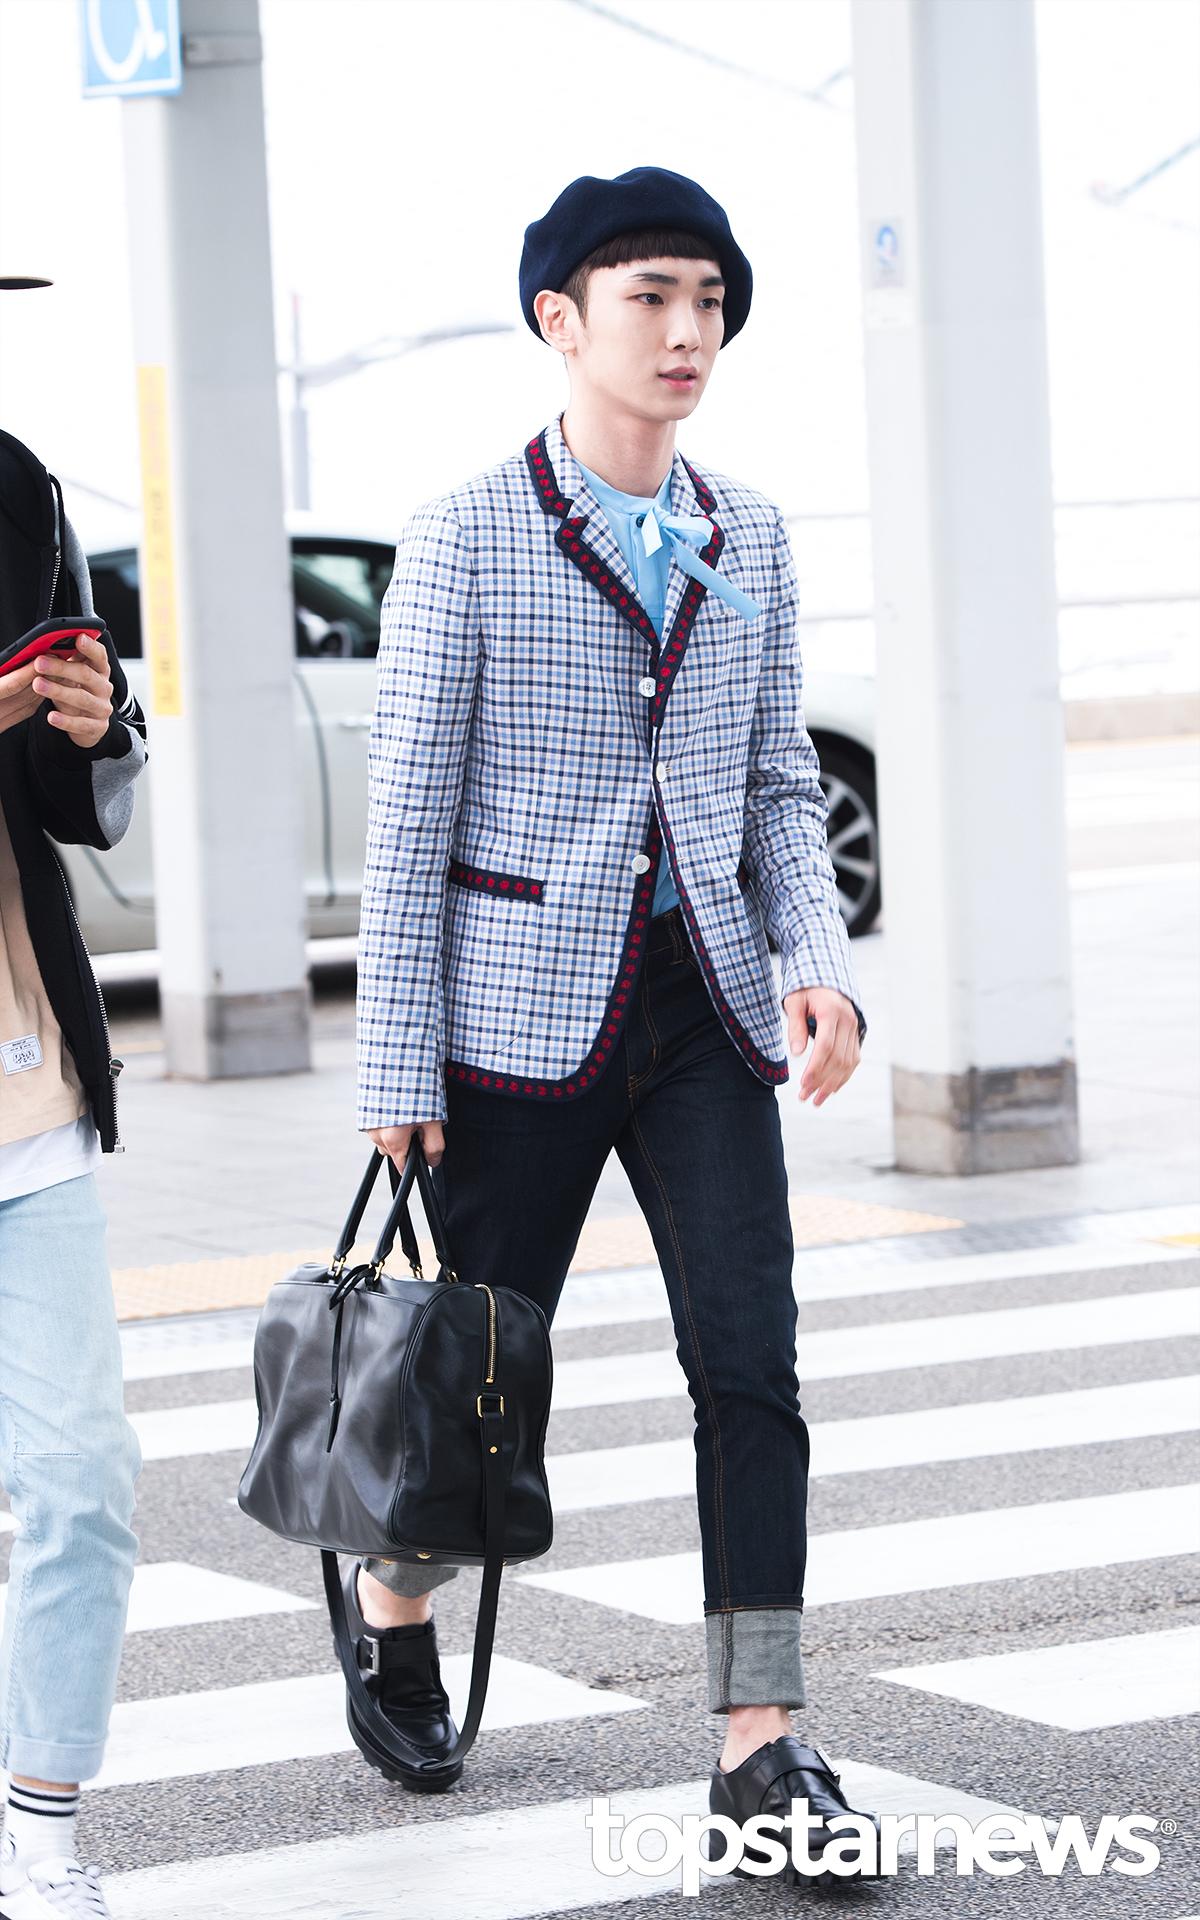 [IMG/160715] Jonghyun, Key @ Aeropuerto Incheon hacia Japón. Fui8yrqs